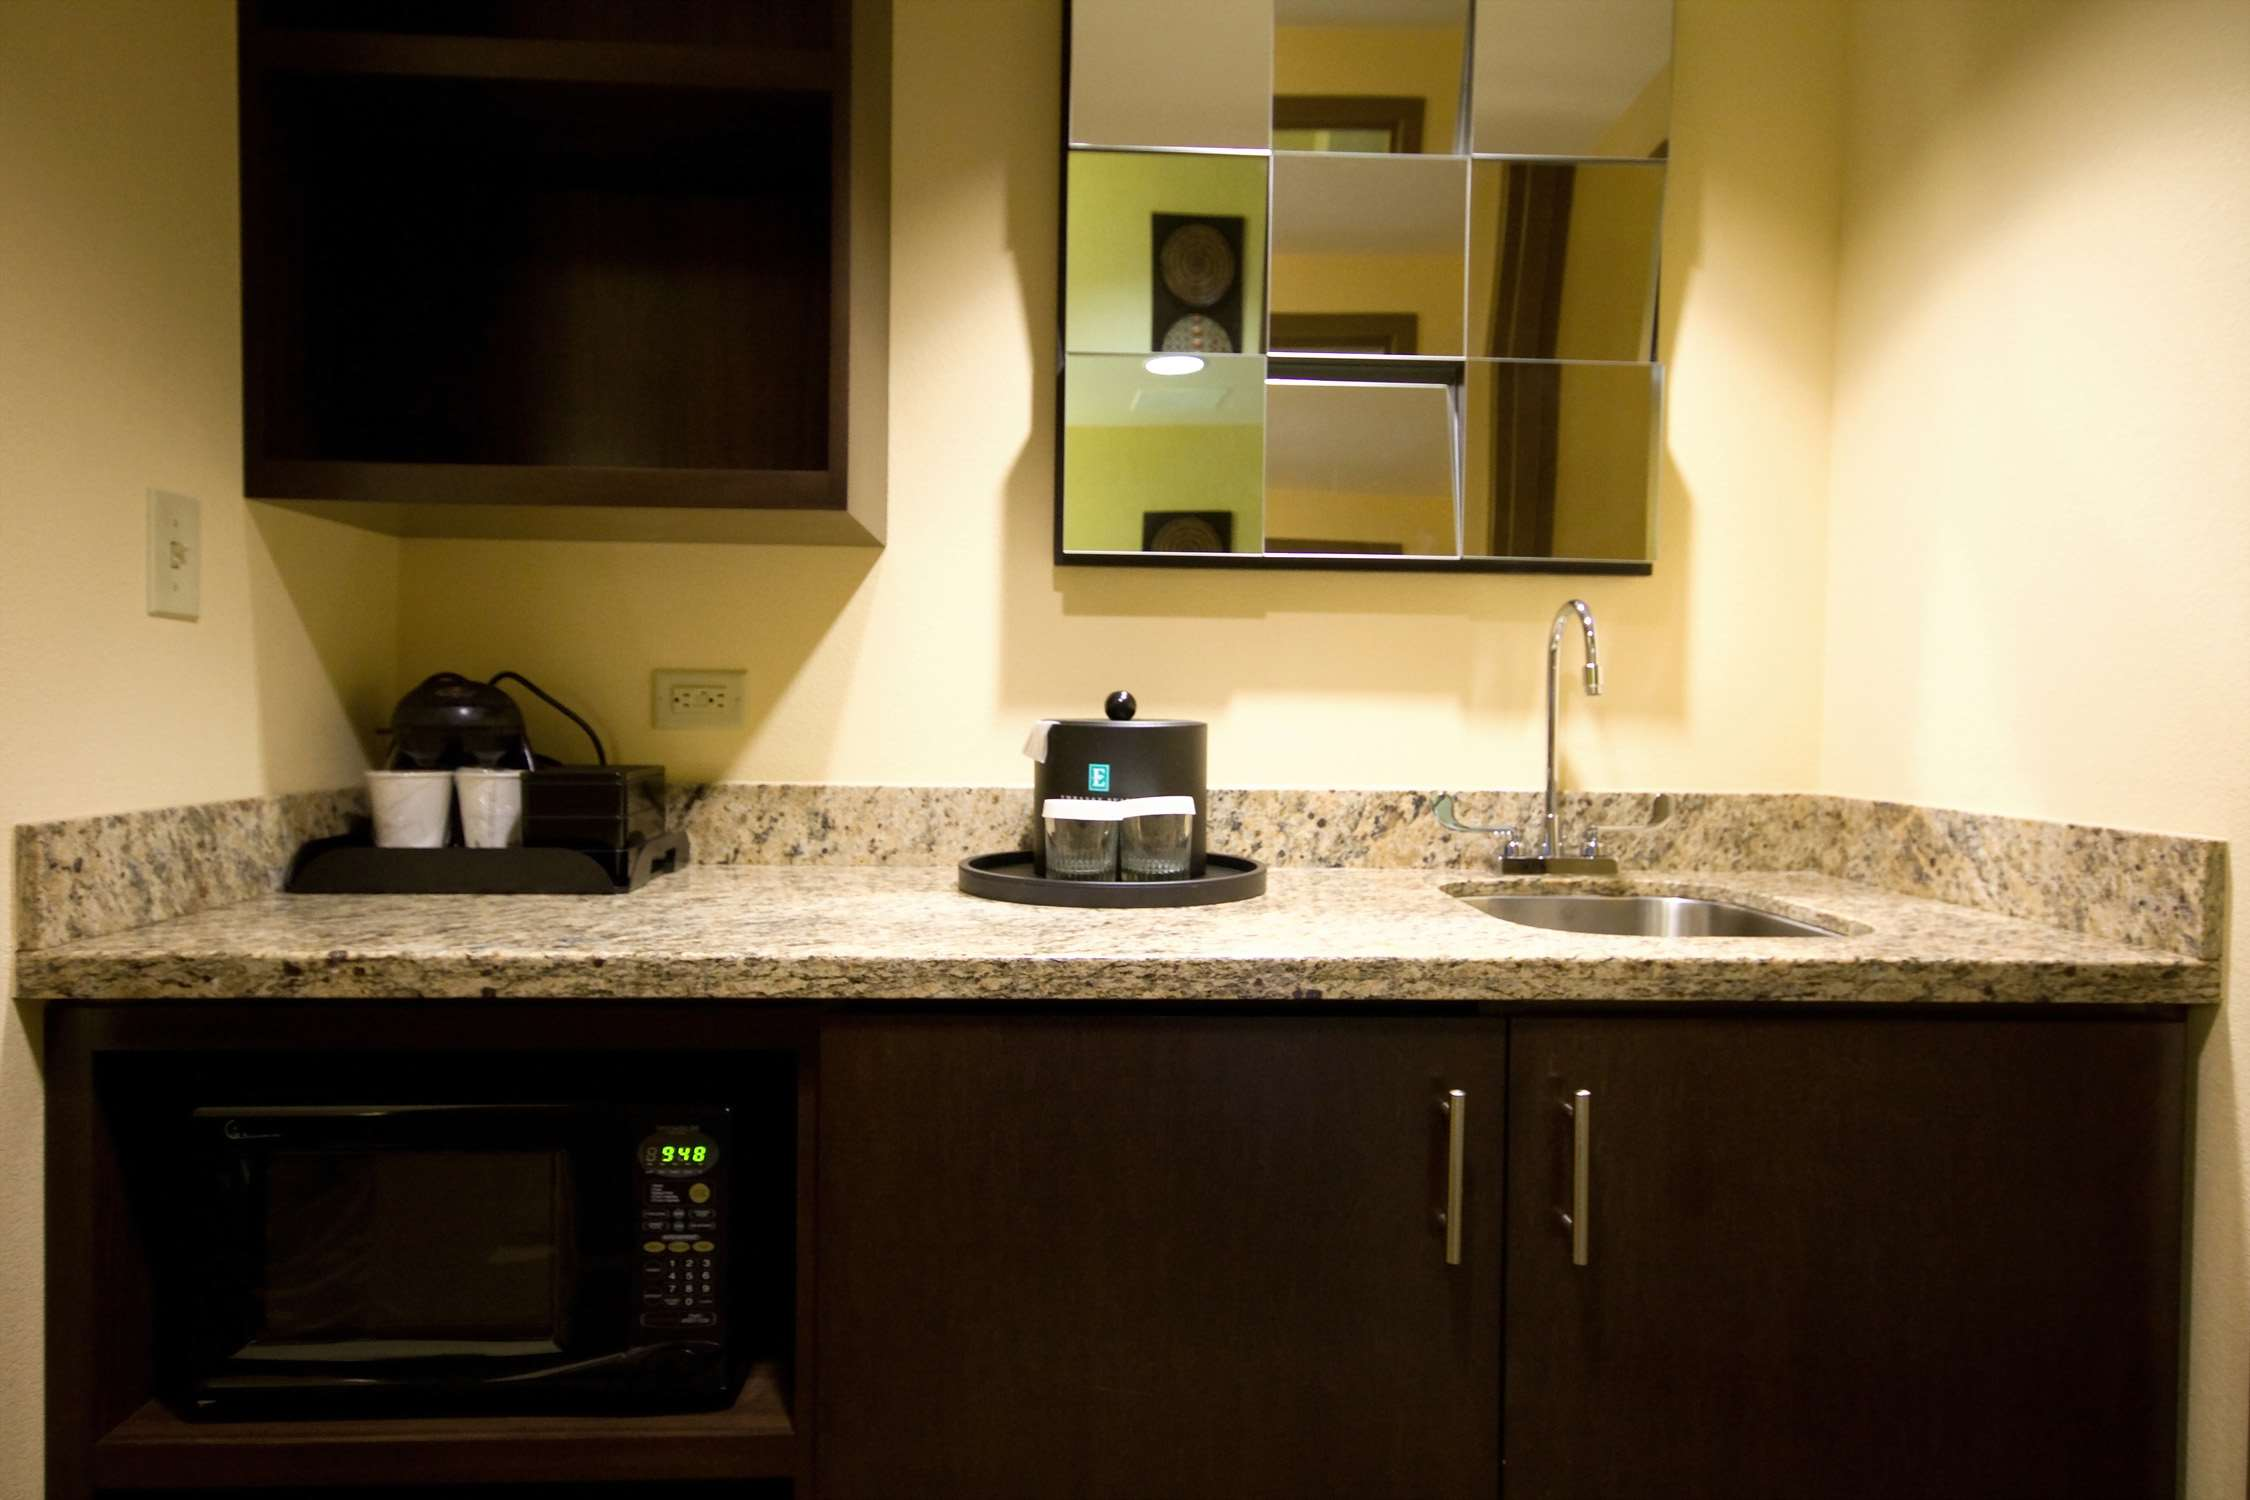 Embassy Suites by Hilton Houston Energy Corridor image 22